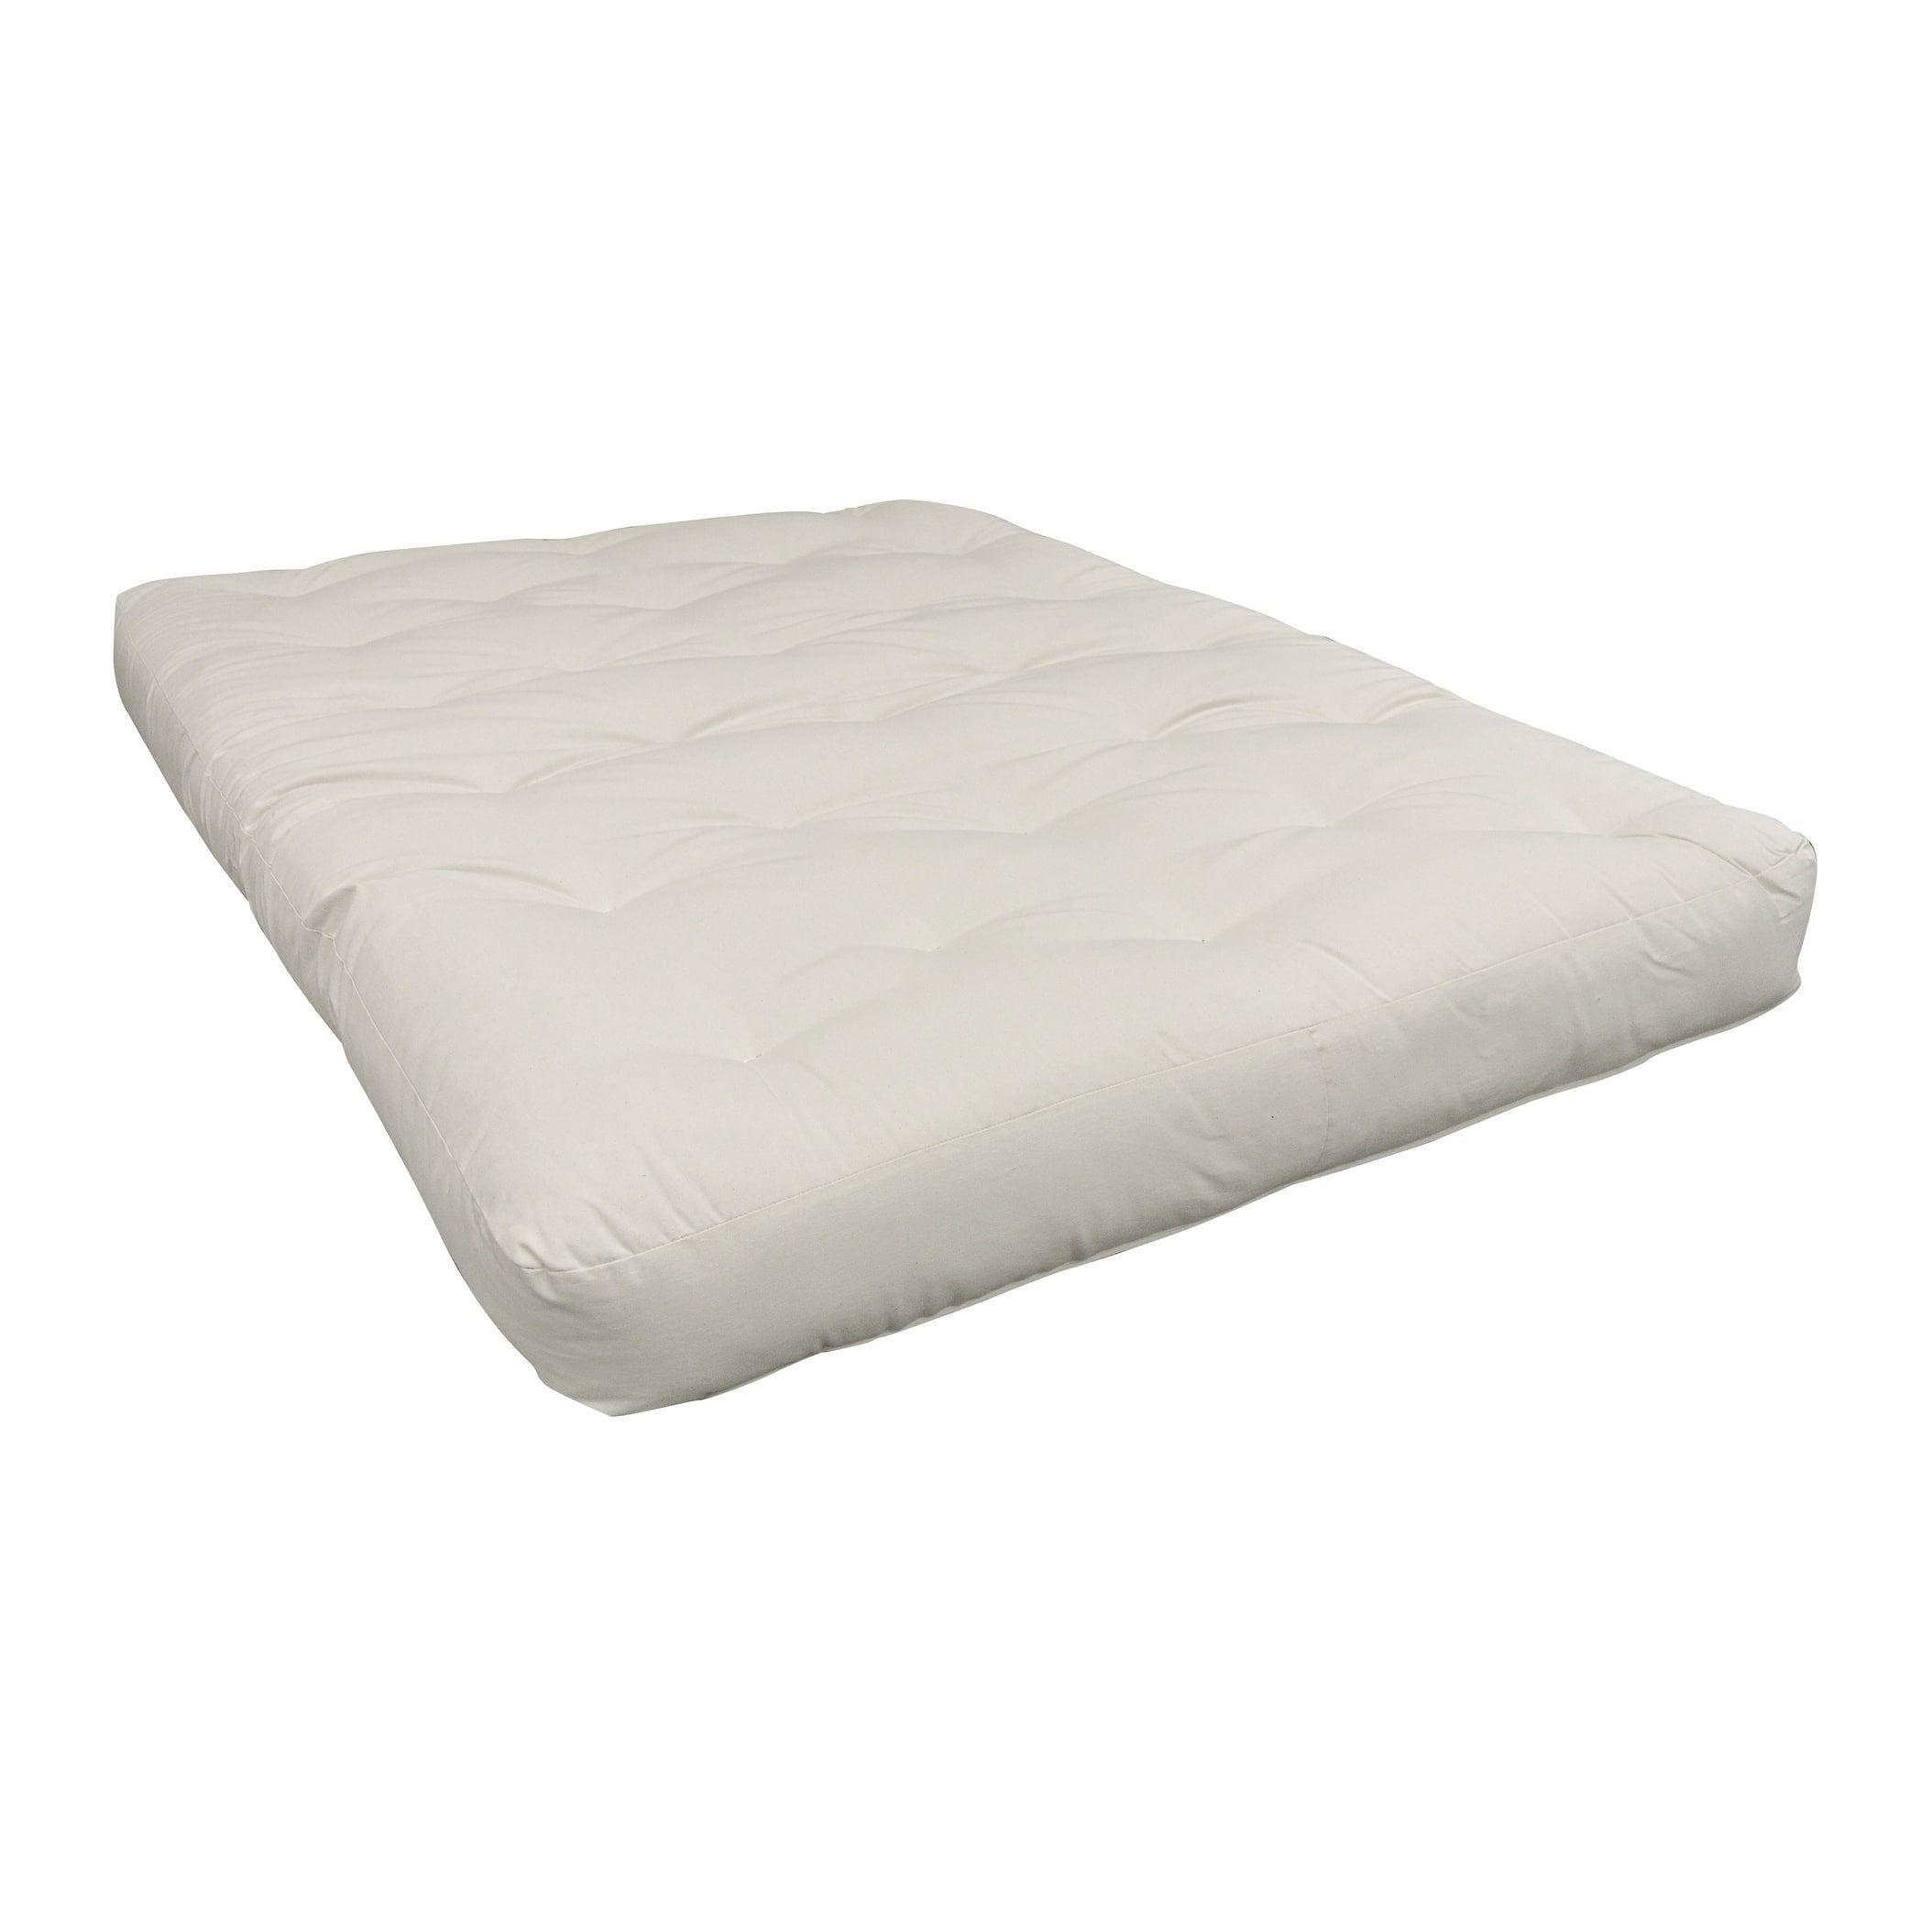 10 Double Foam Cott Size 30x75 Futon Mattress